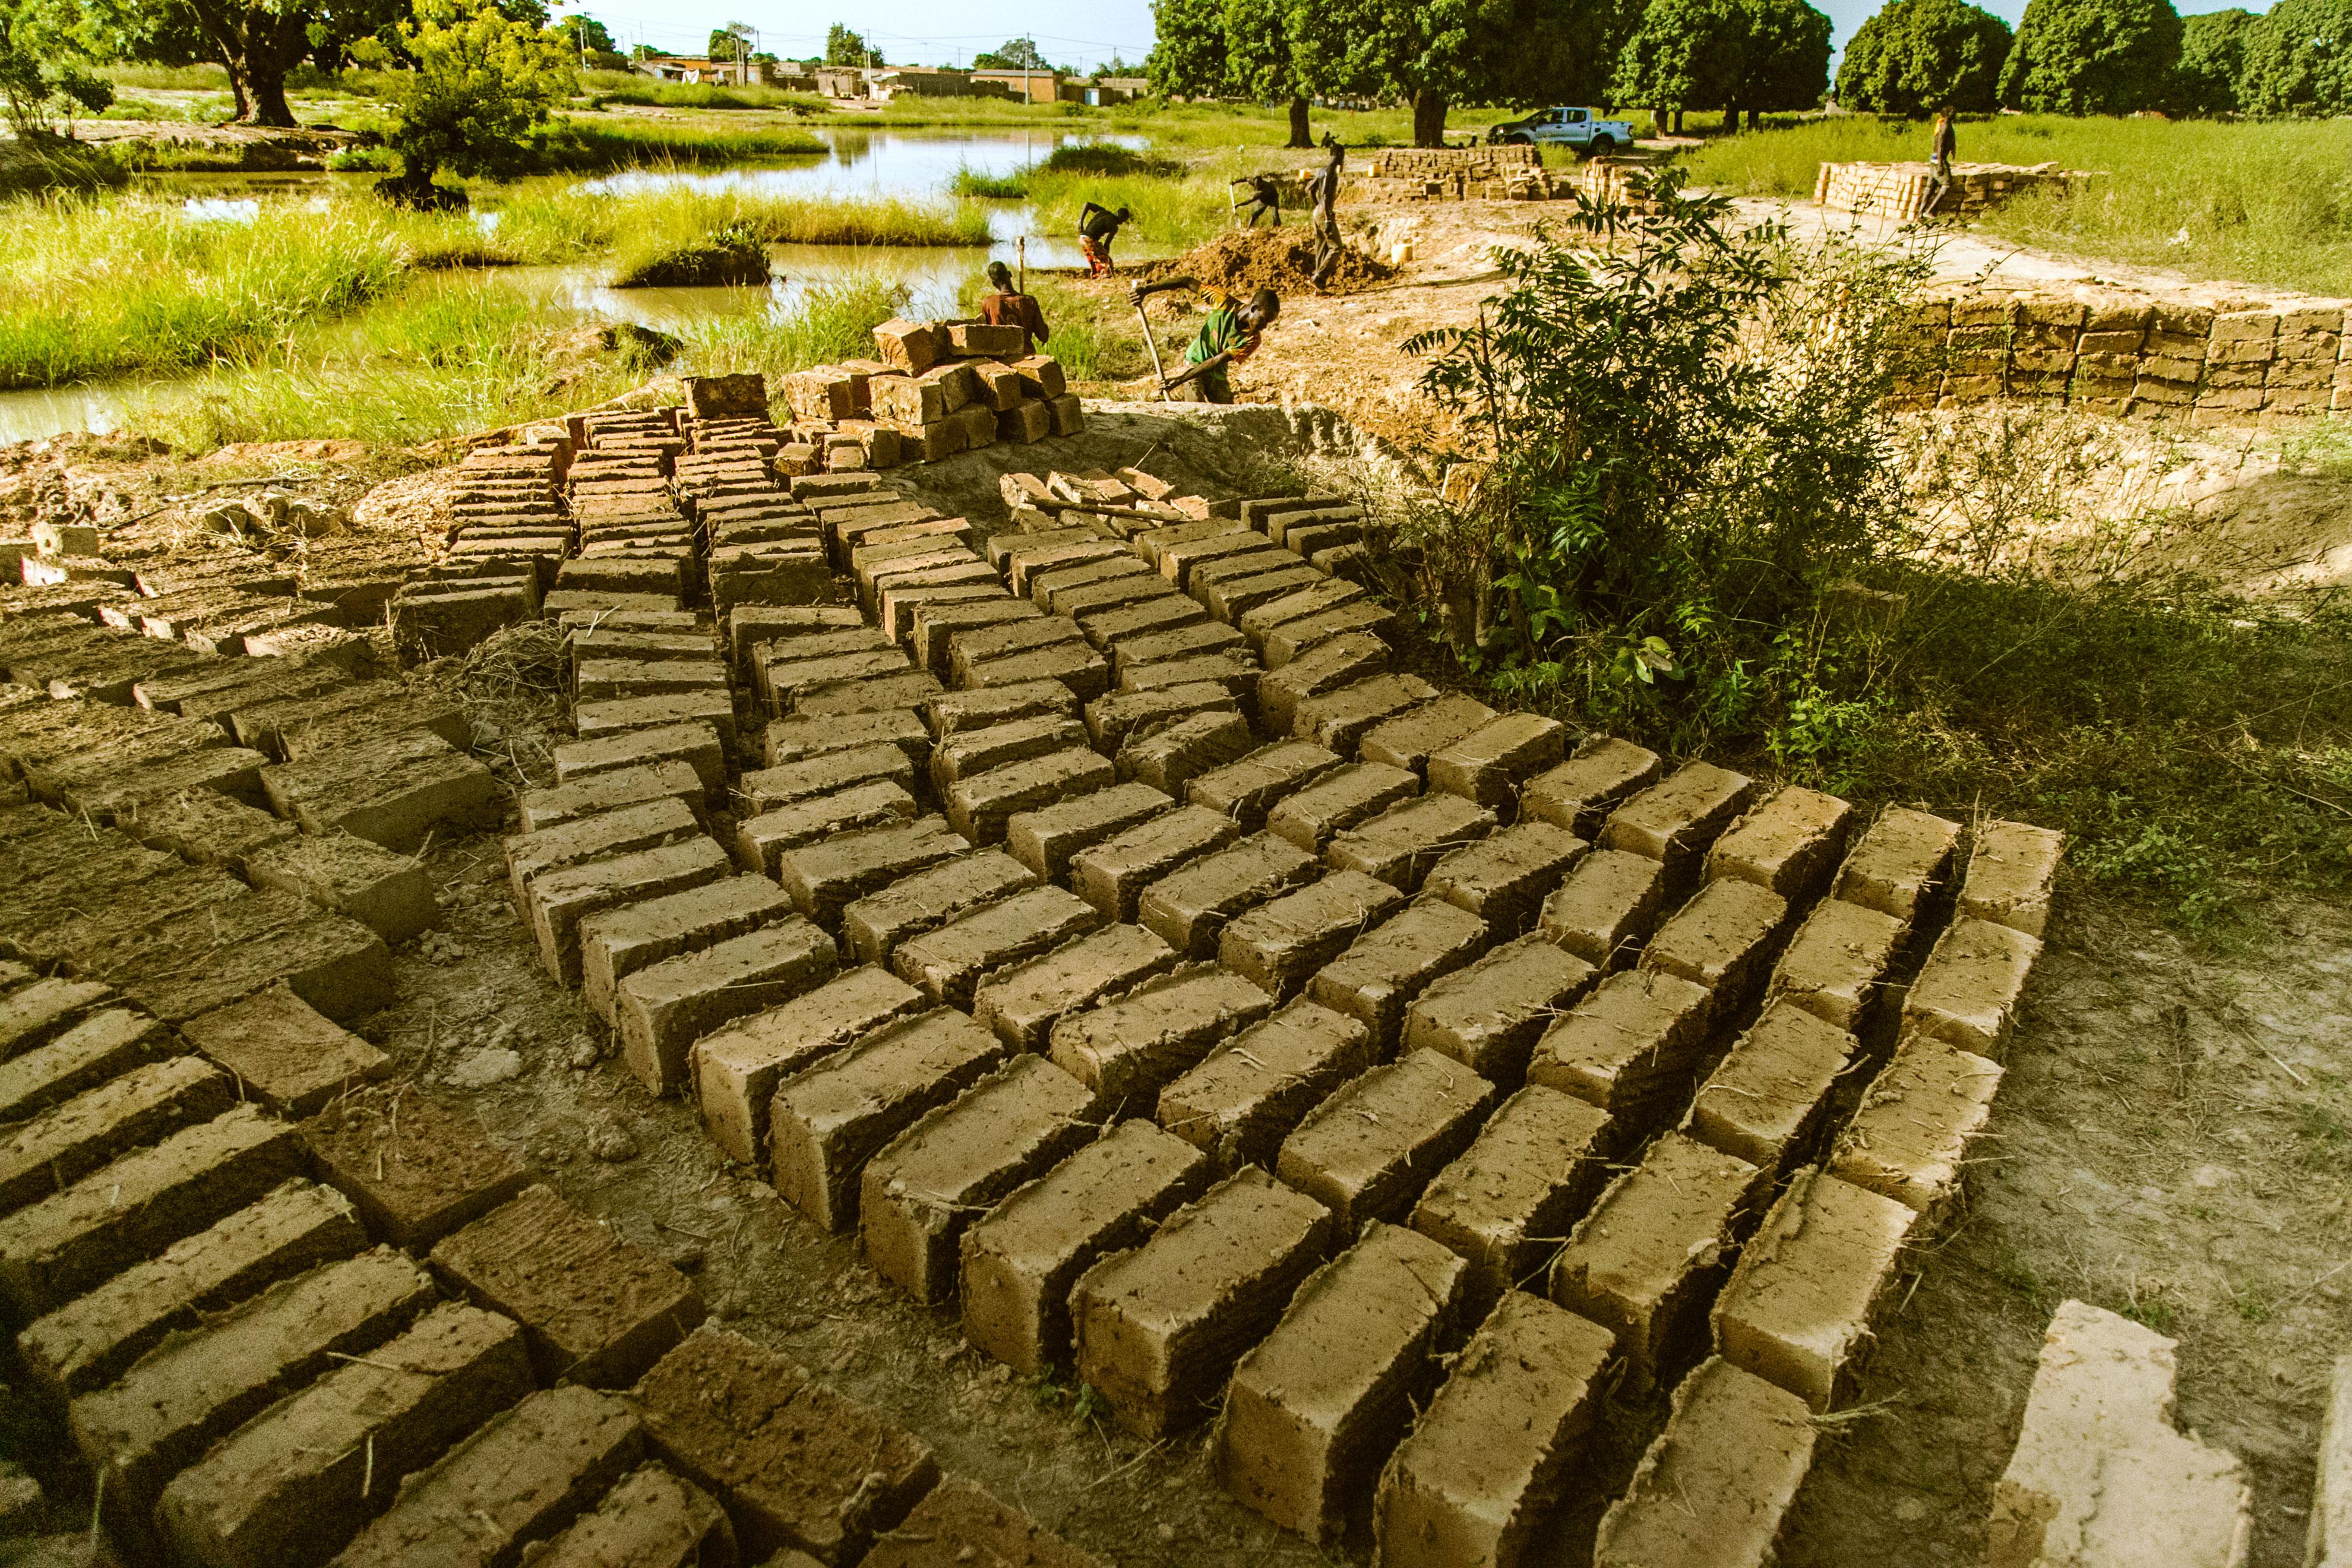 Bricks_Earth_Roofs_in_the_Sahel_Program.jpg